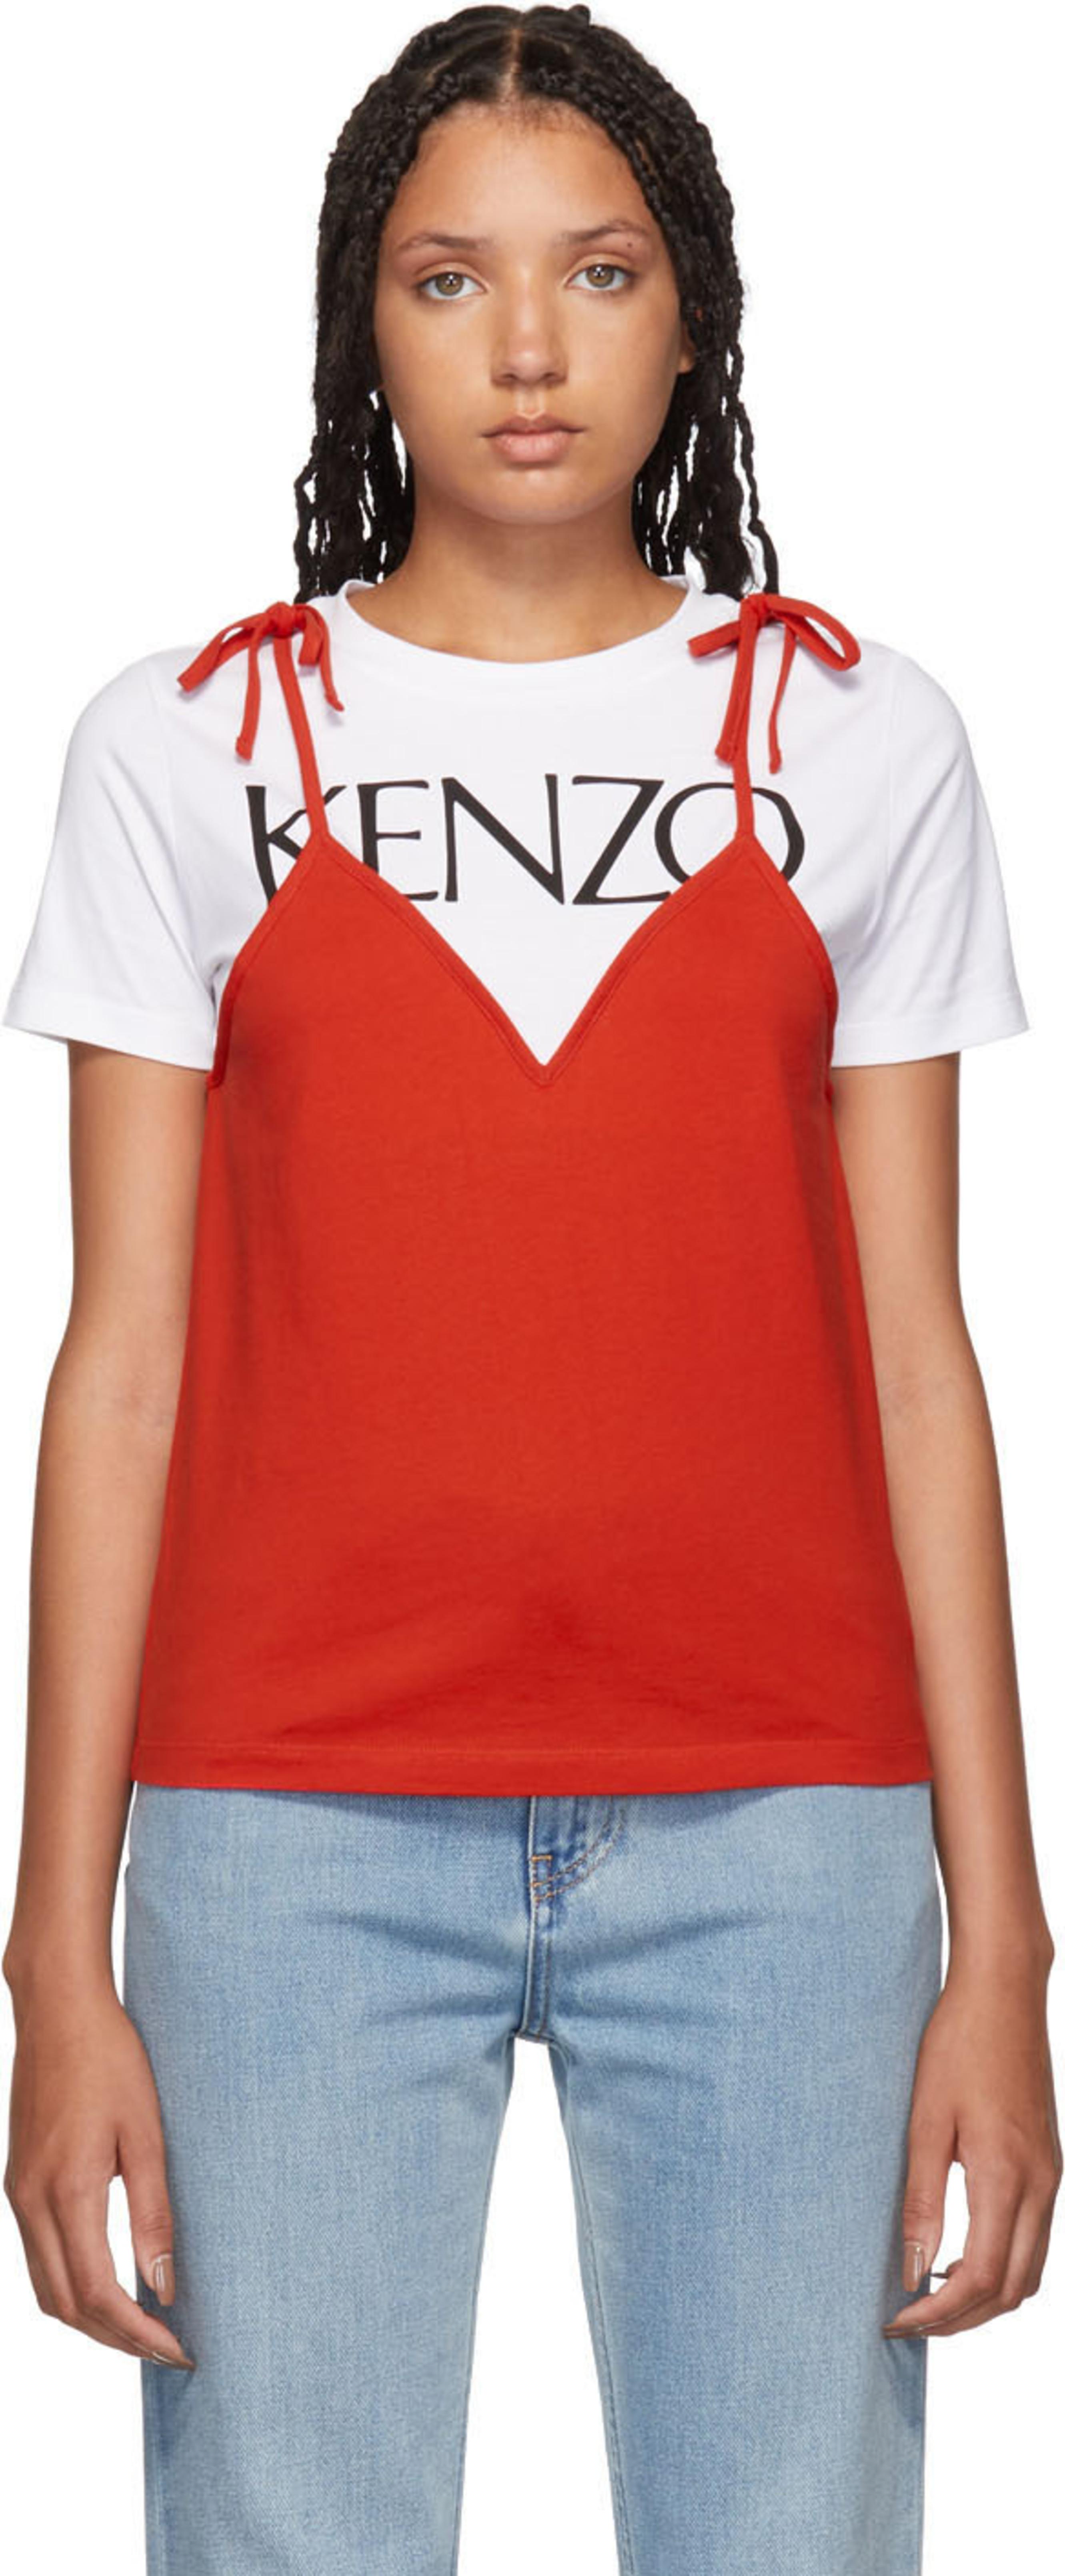 49cc86bae9da Kenzo for Women FW19 Collection | SSENSE Canada